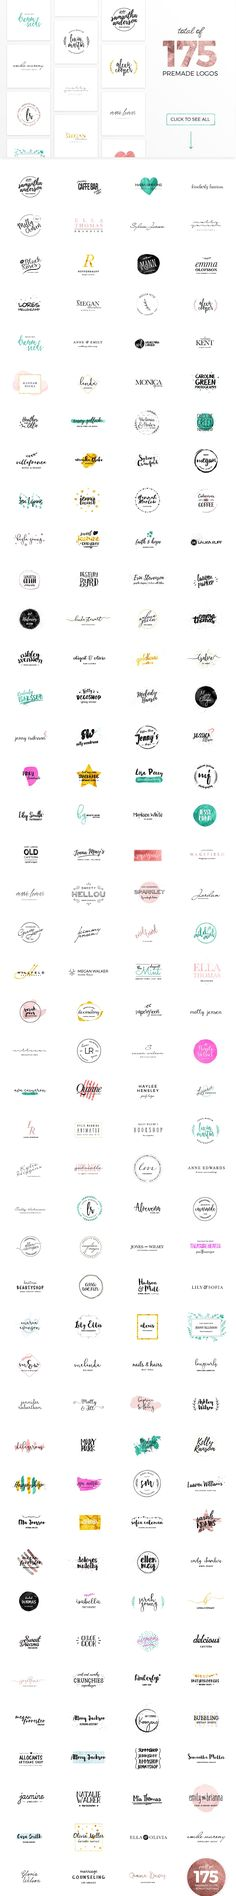 The Humongous Girlpreneurs Logo Pack by WornOutMedia Co. on @creativemarket